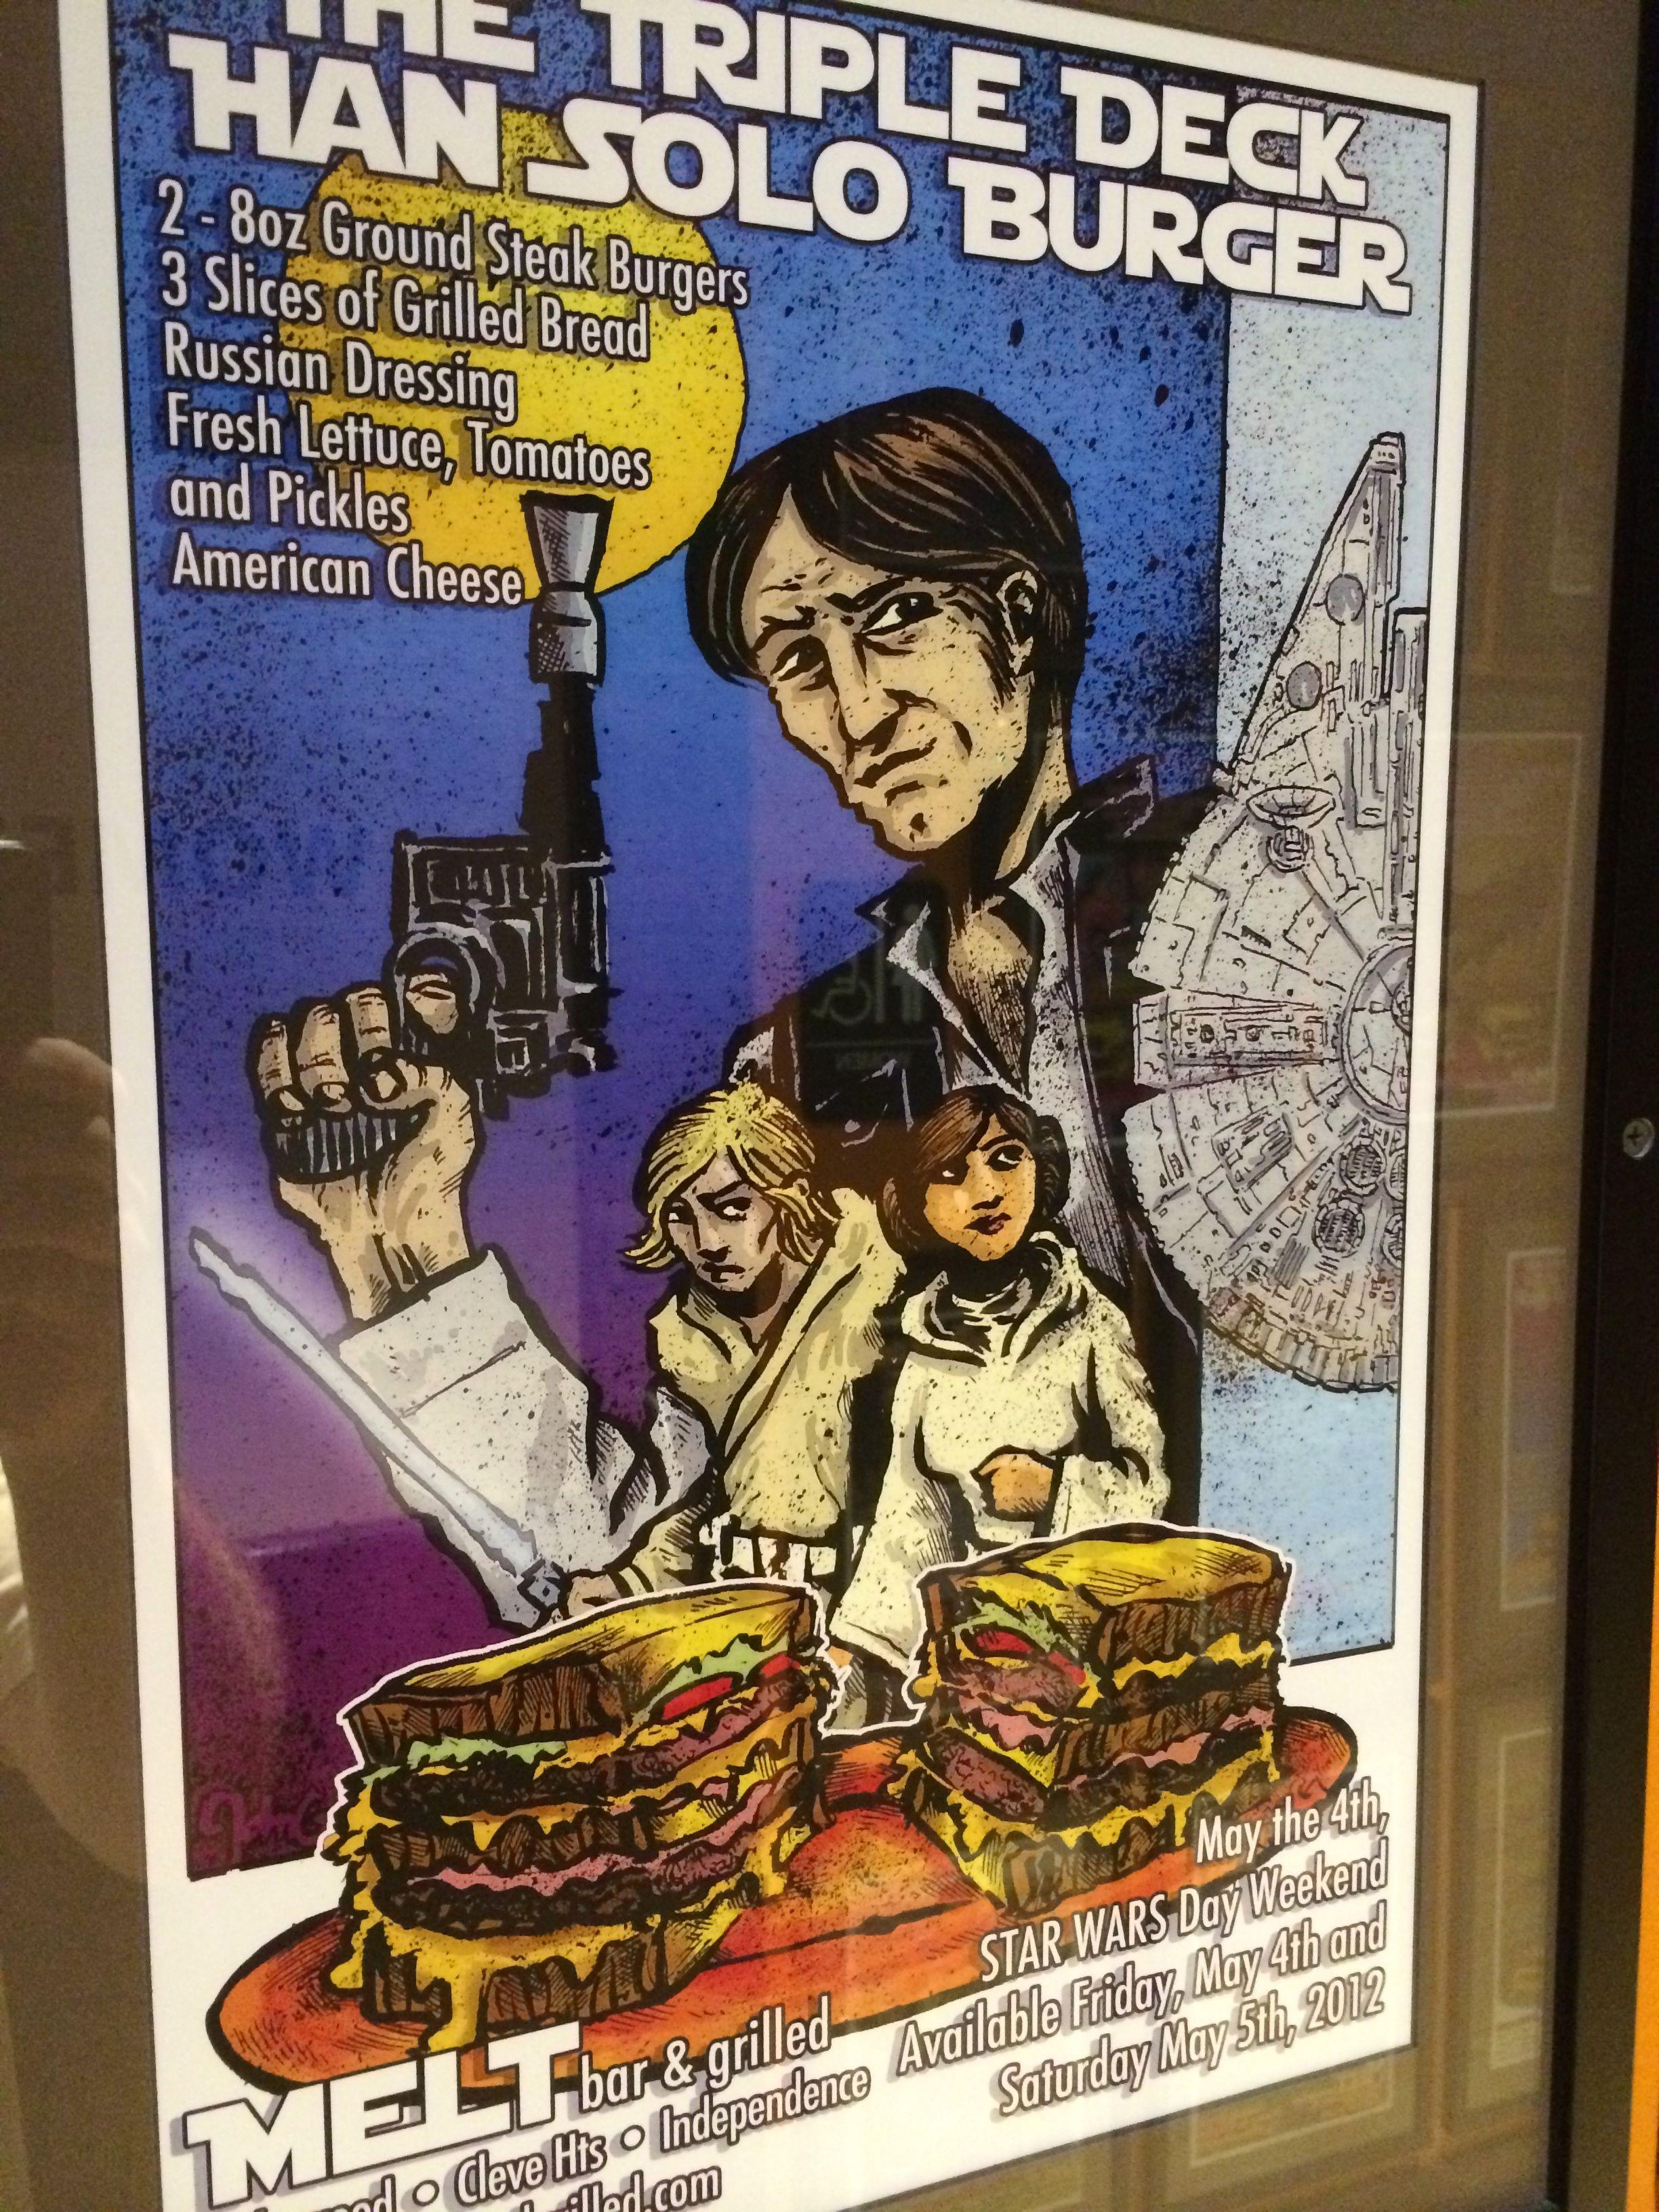 The Triple Deck Han Solo Burger